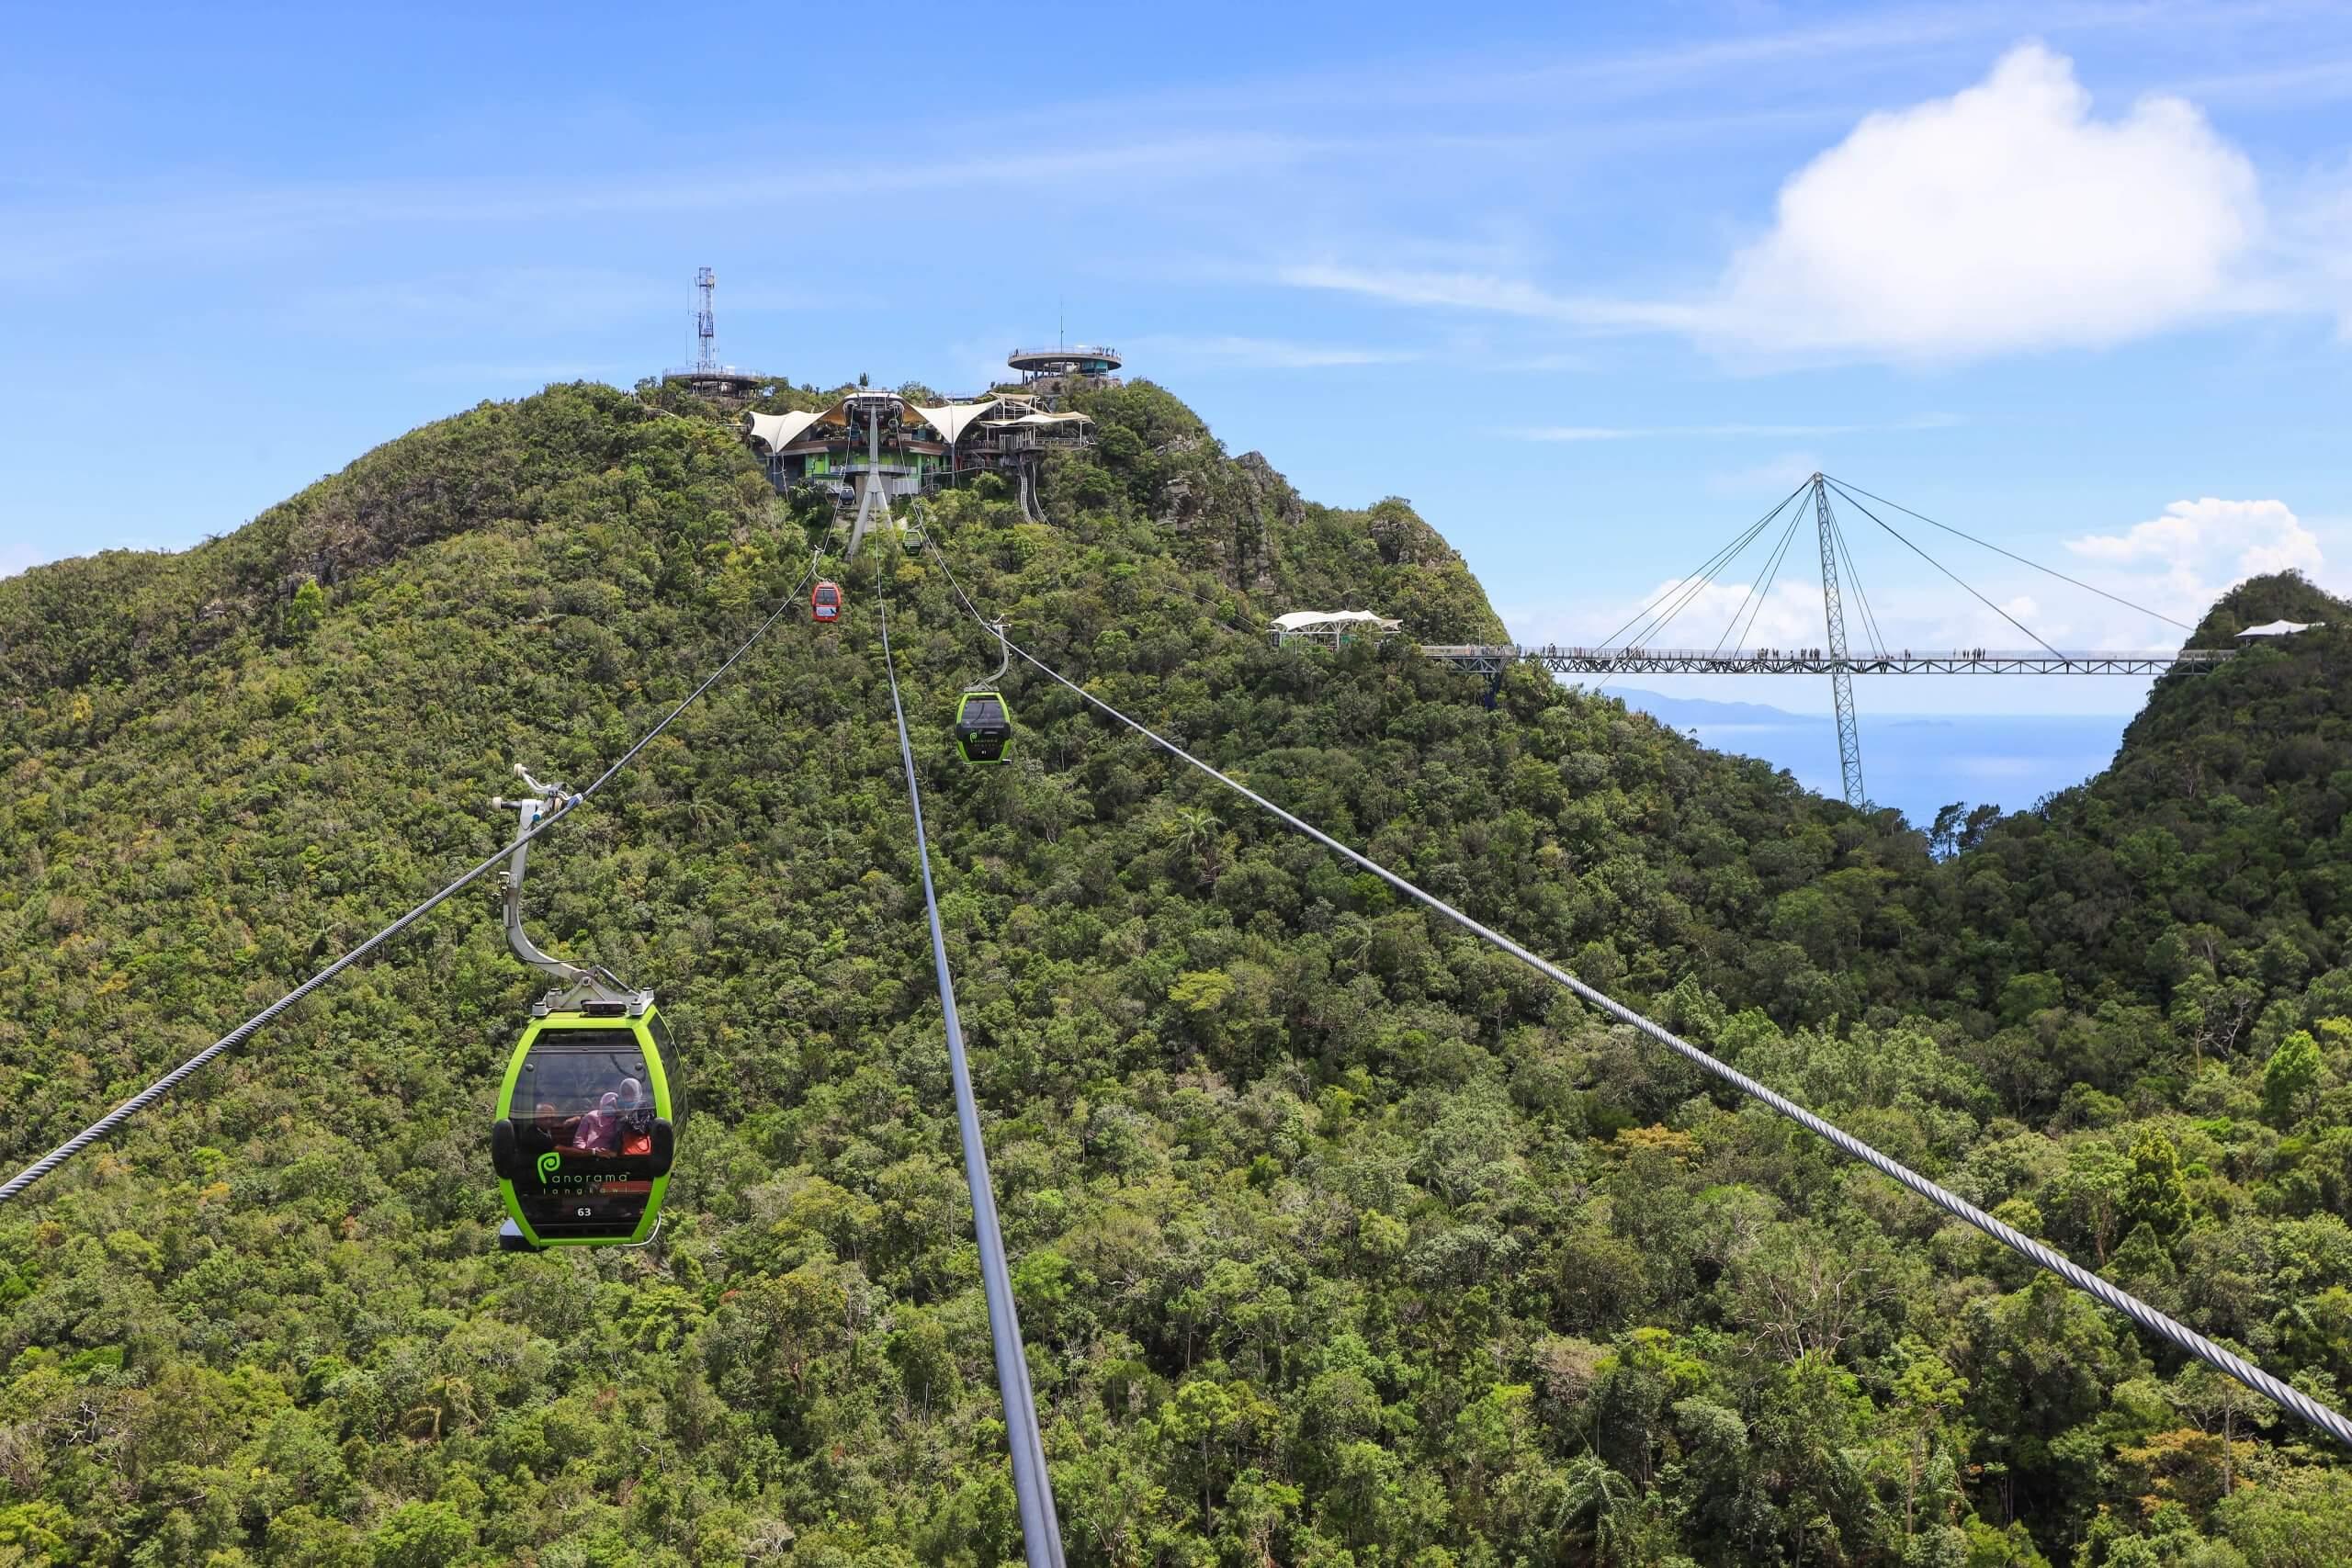 langkawi cable car skycab view